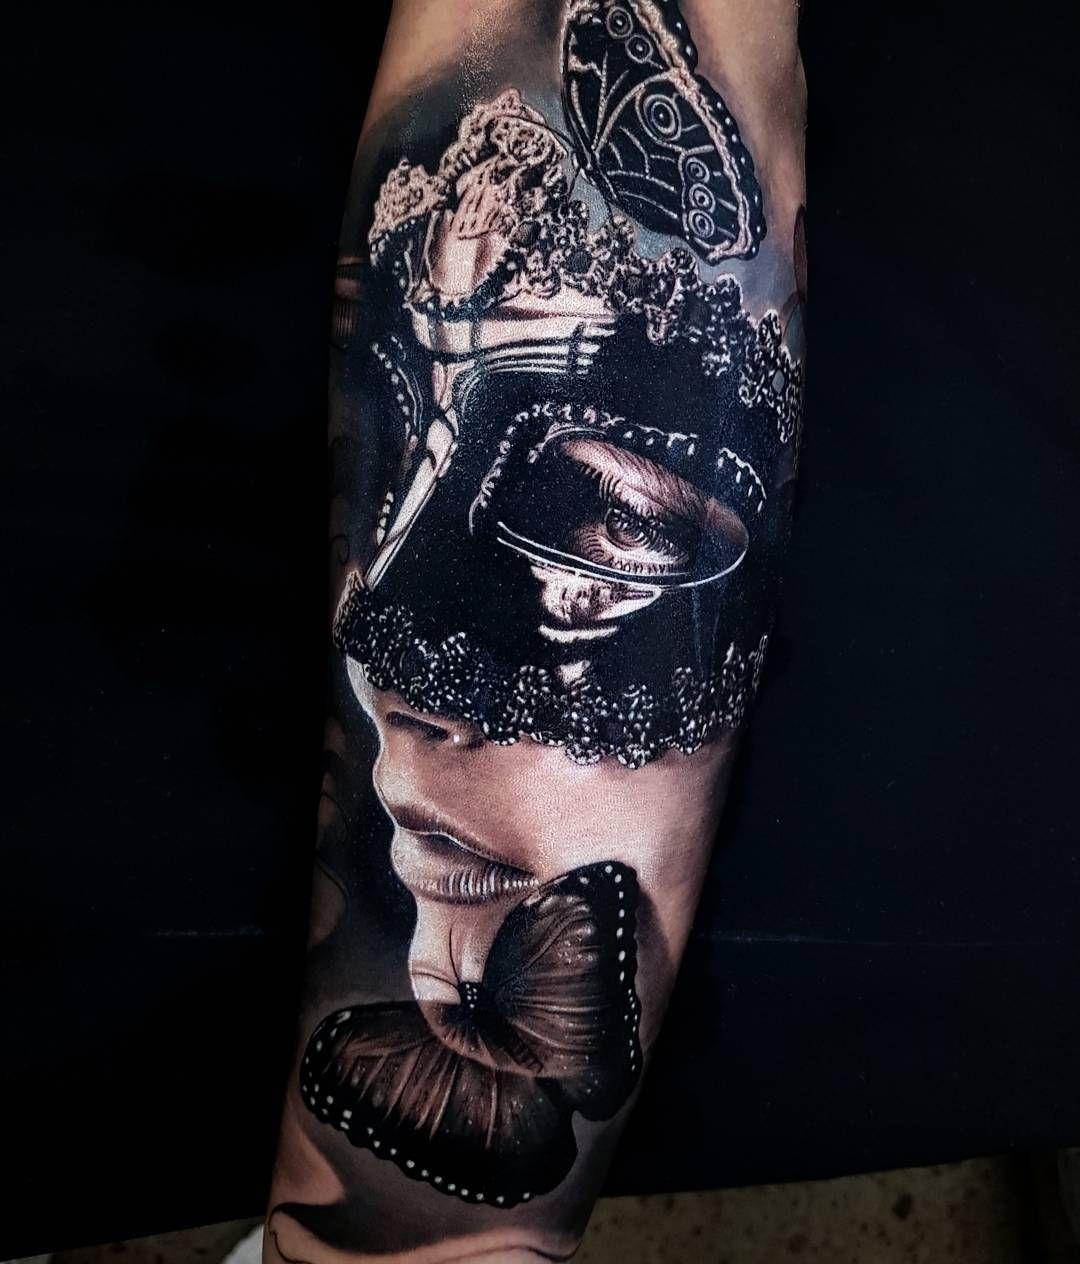 Portrait Realism By Benji Roketlauncha Ortega Tatuaze Rekawy Inspirujacy Tatuaz